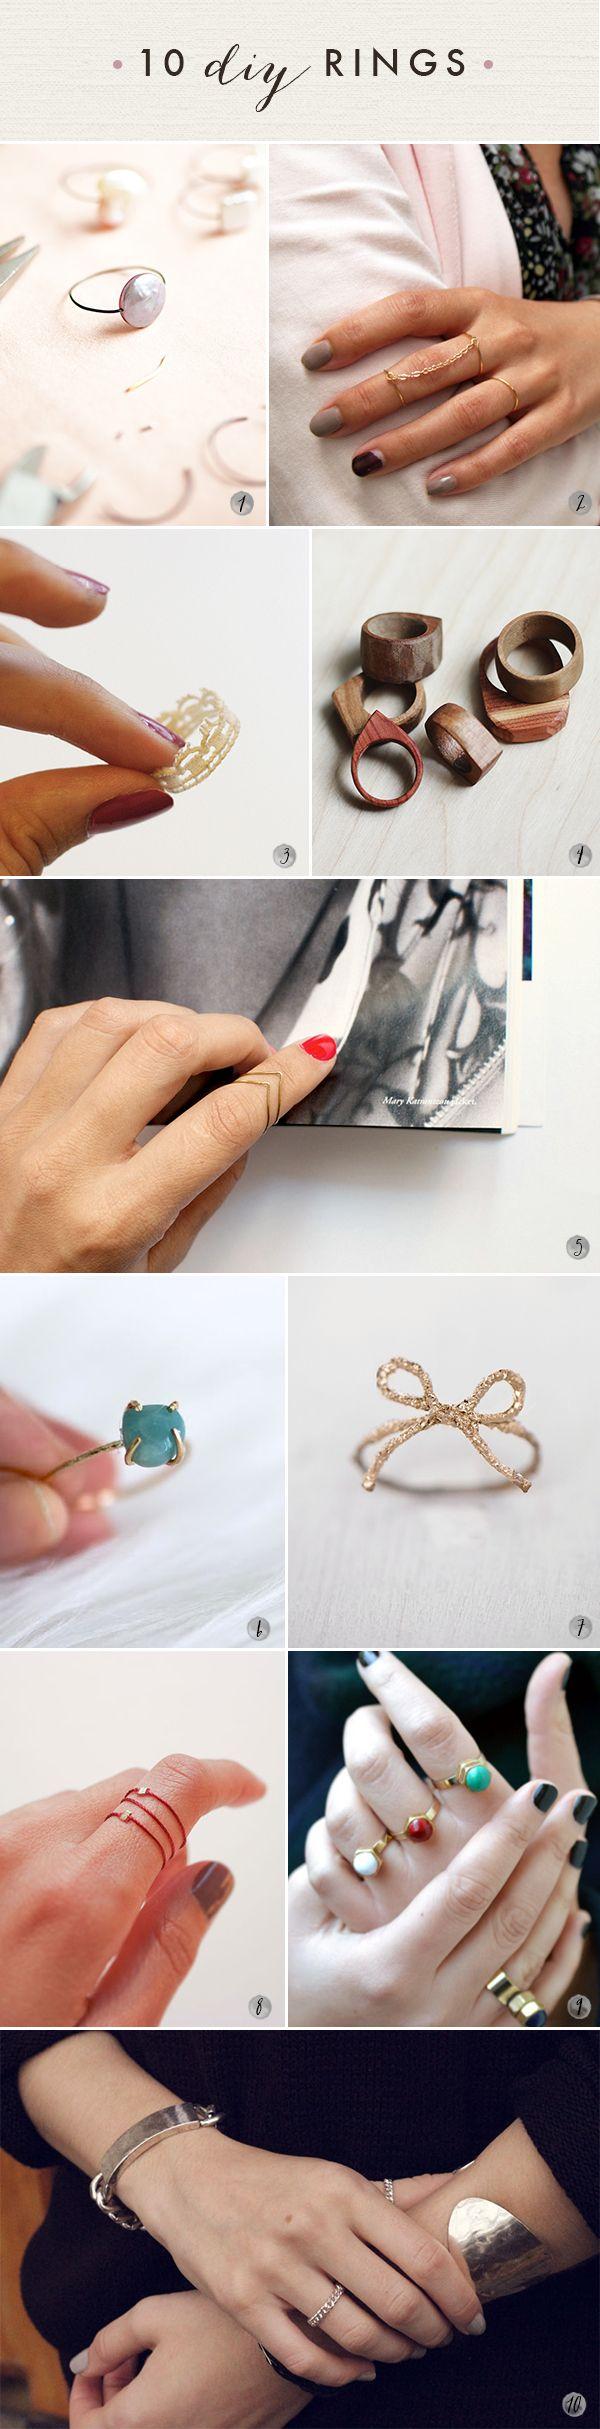 diy jewelry 7